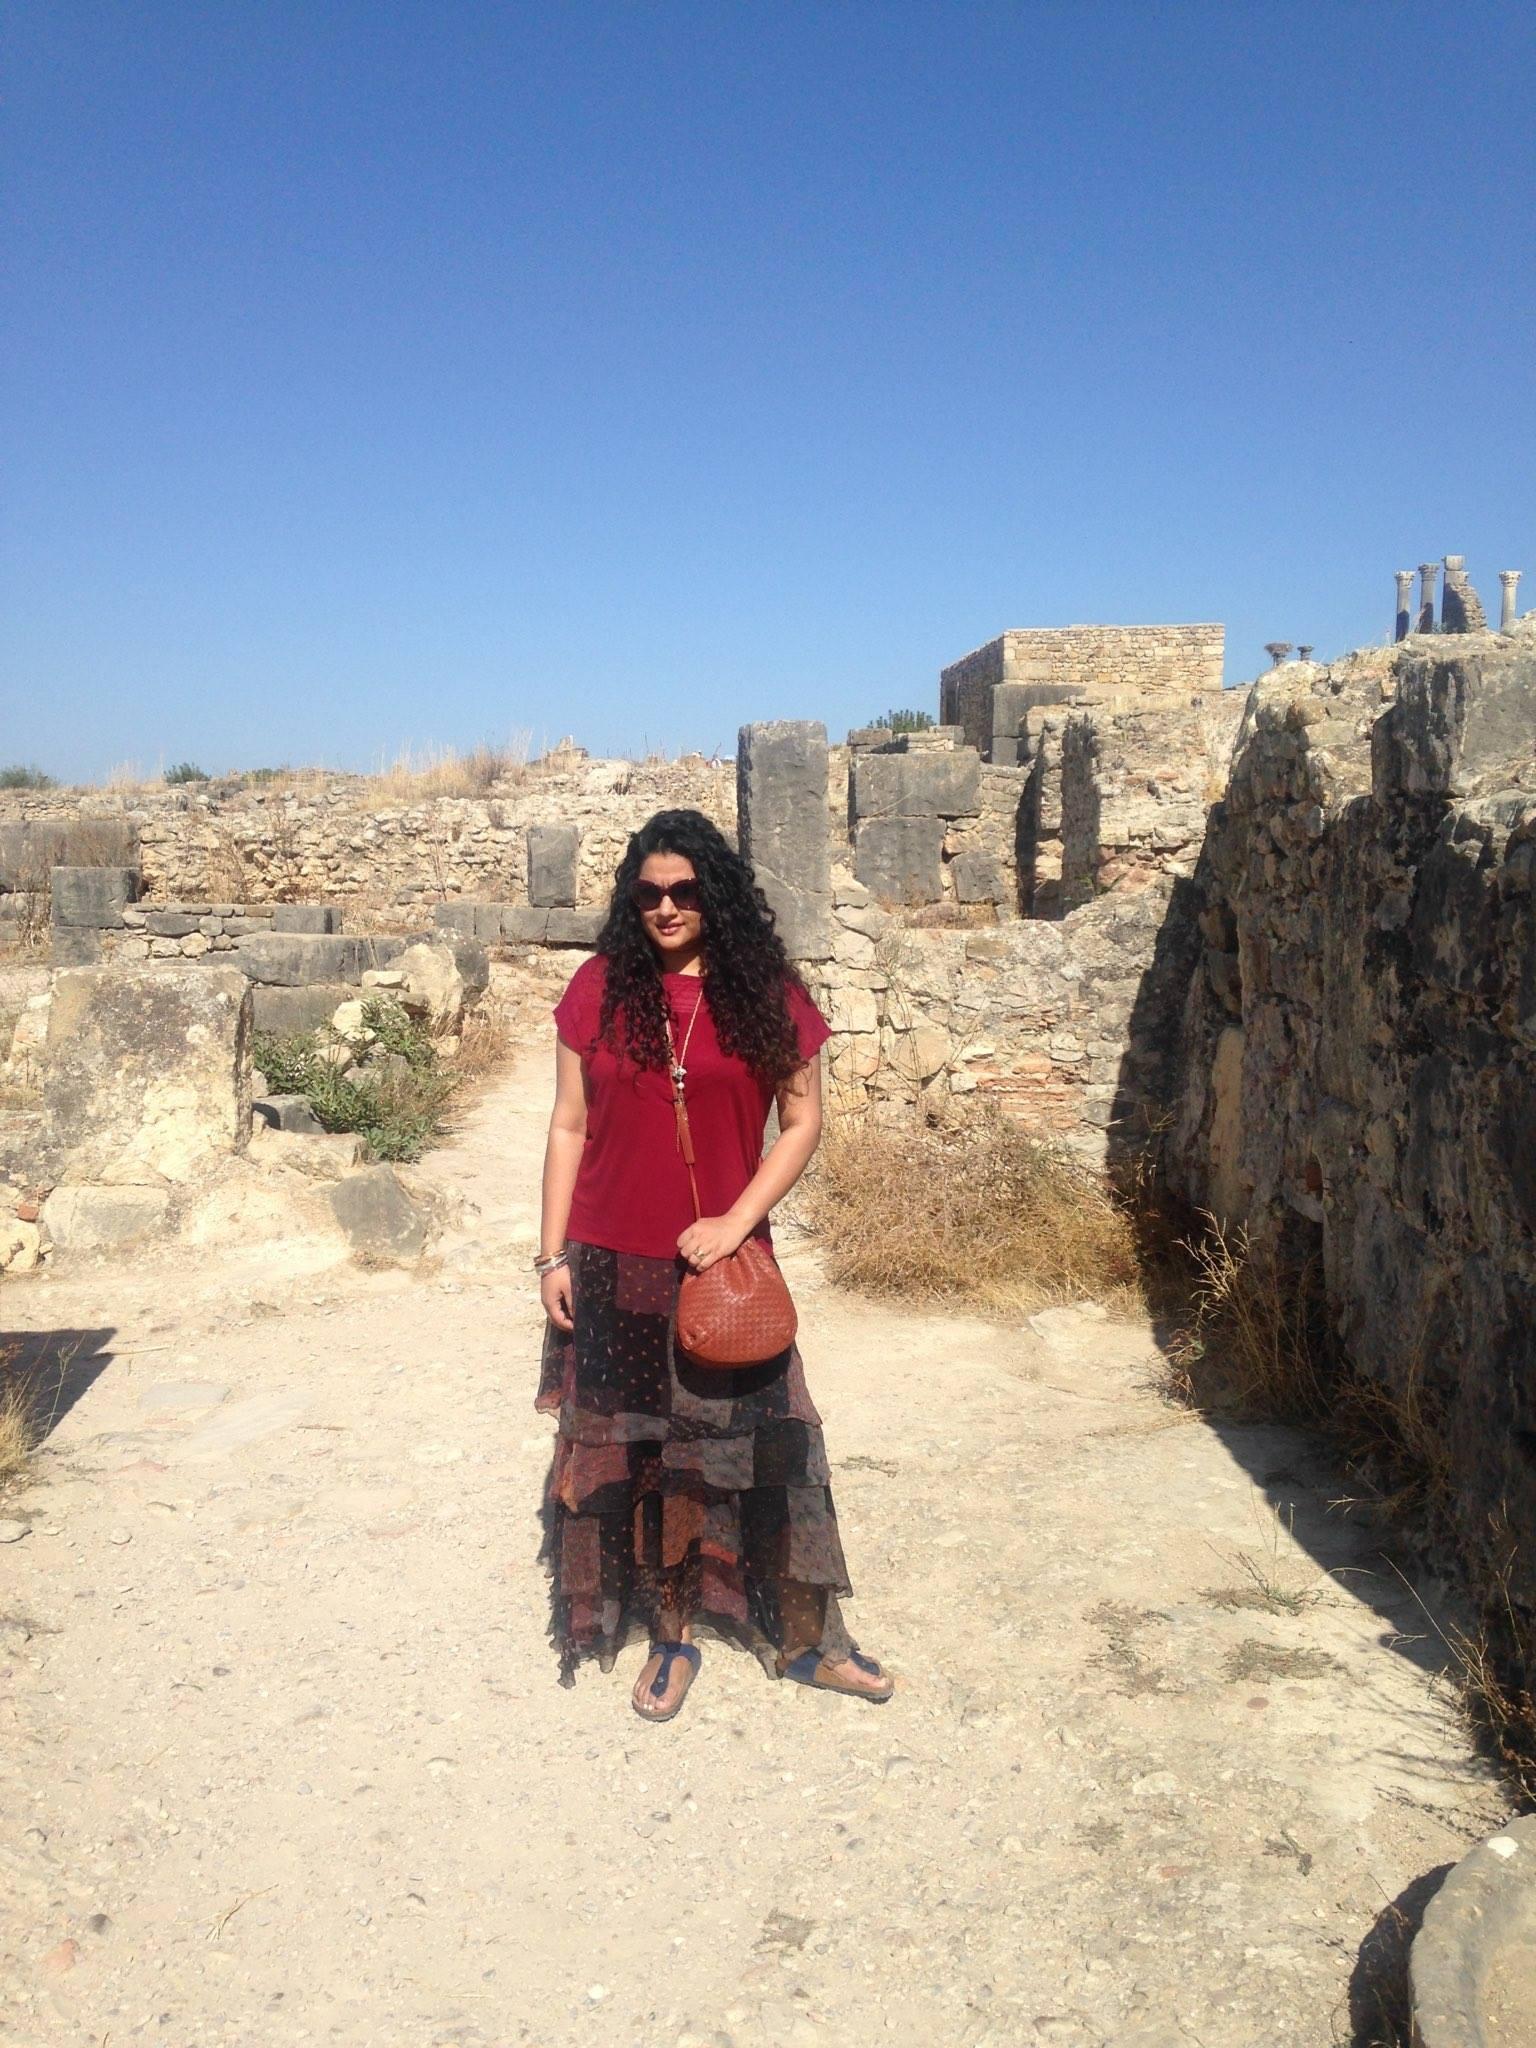 Skirt: Label by Ritu Kumar, Sandals: Birkenstock, Top: Ralph Lauren, Sling: Bottega Veneta, Bangles: Hermes, Neckpiece: Isharya, Sunglasses: Dior, Ring: Bulgari